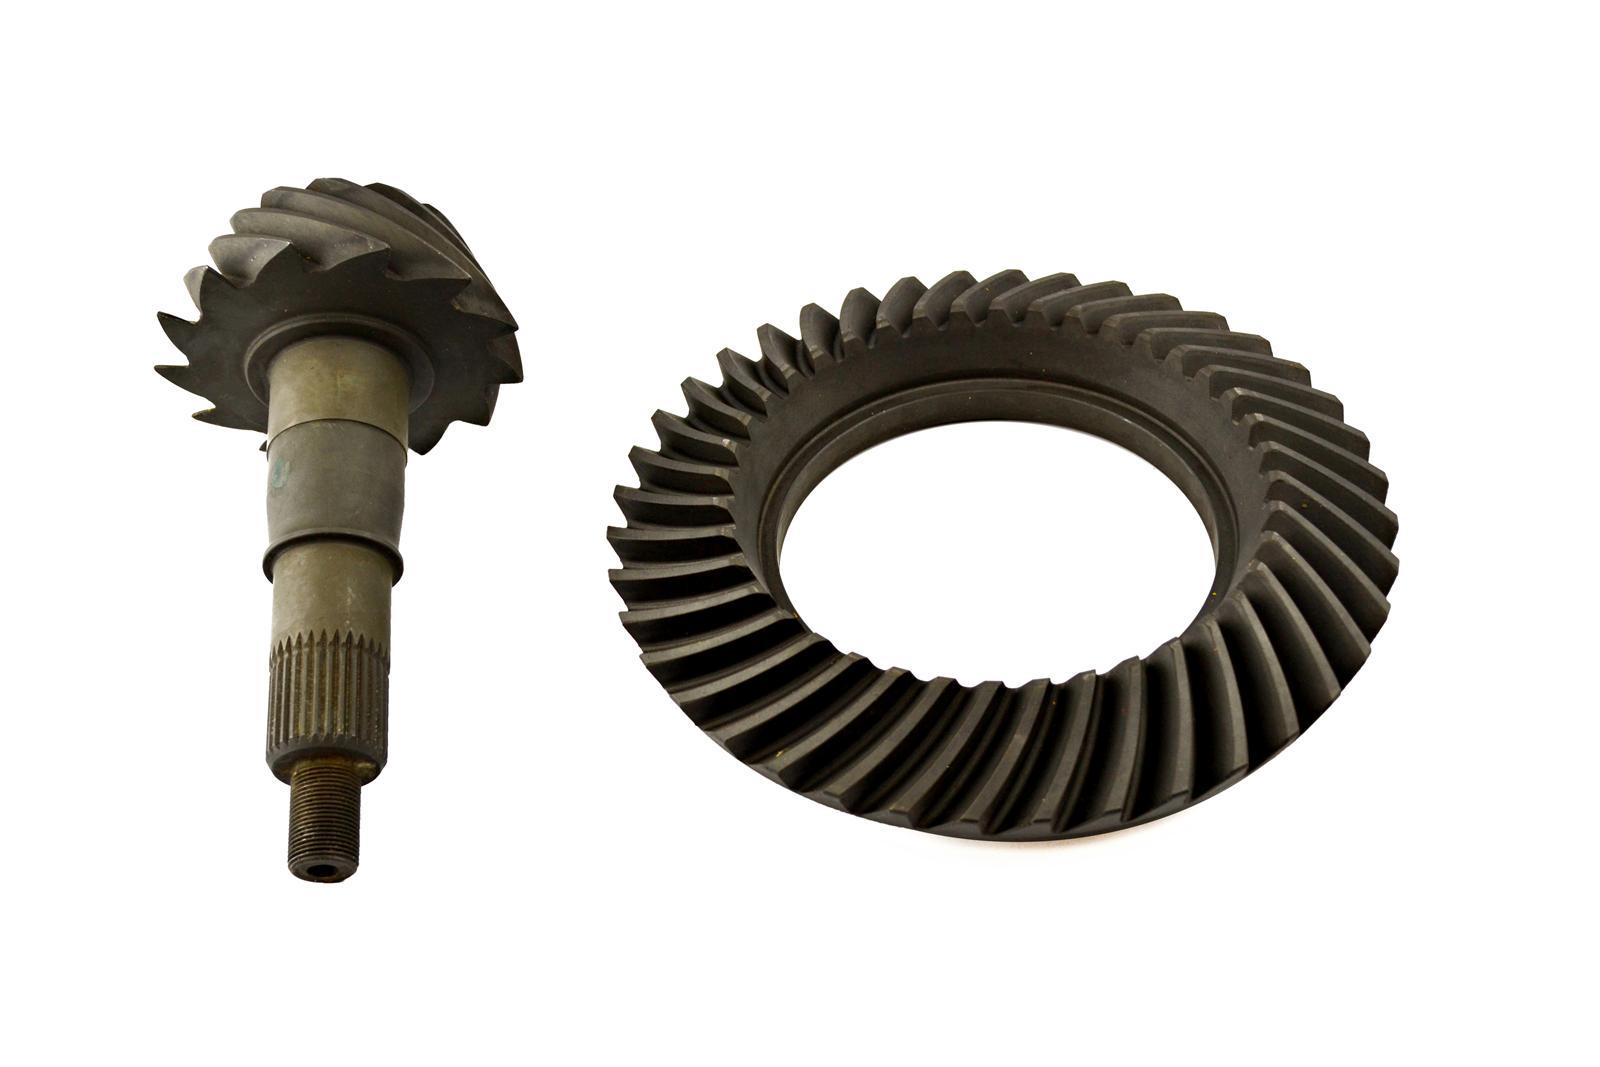 USA Standard Gear ZG F8.8-308 Ring /& Pinion Gear Sets